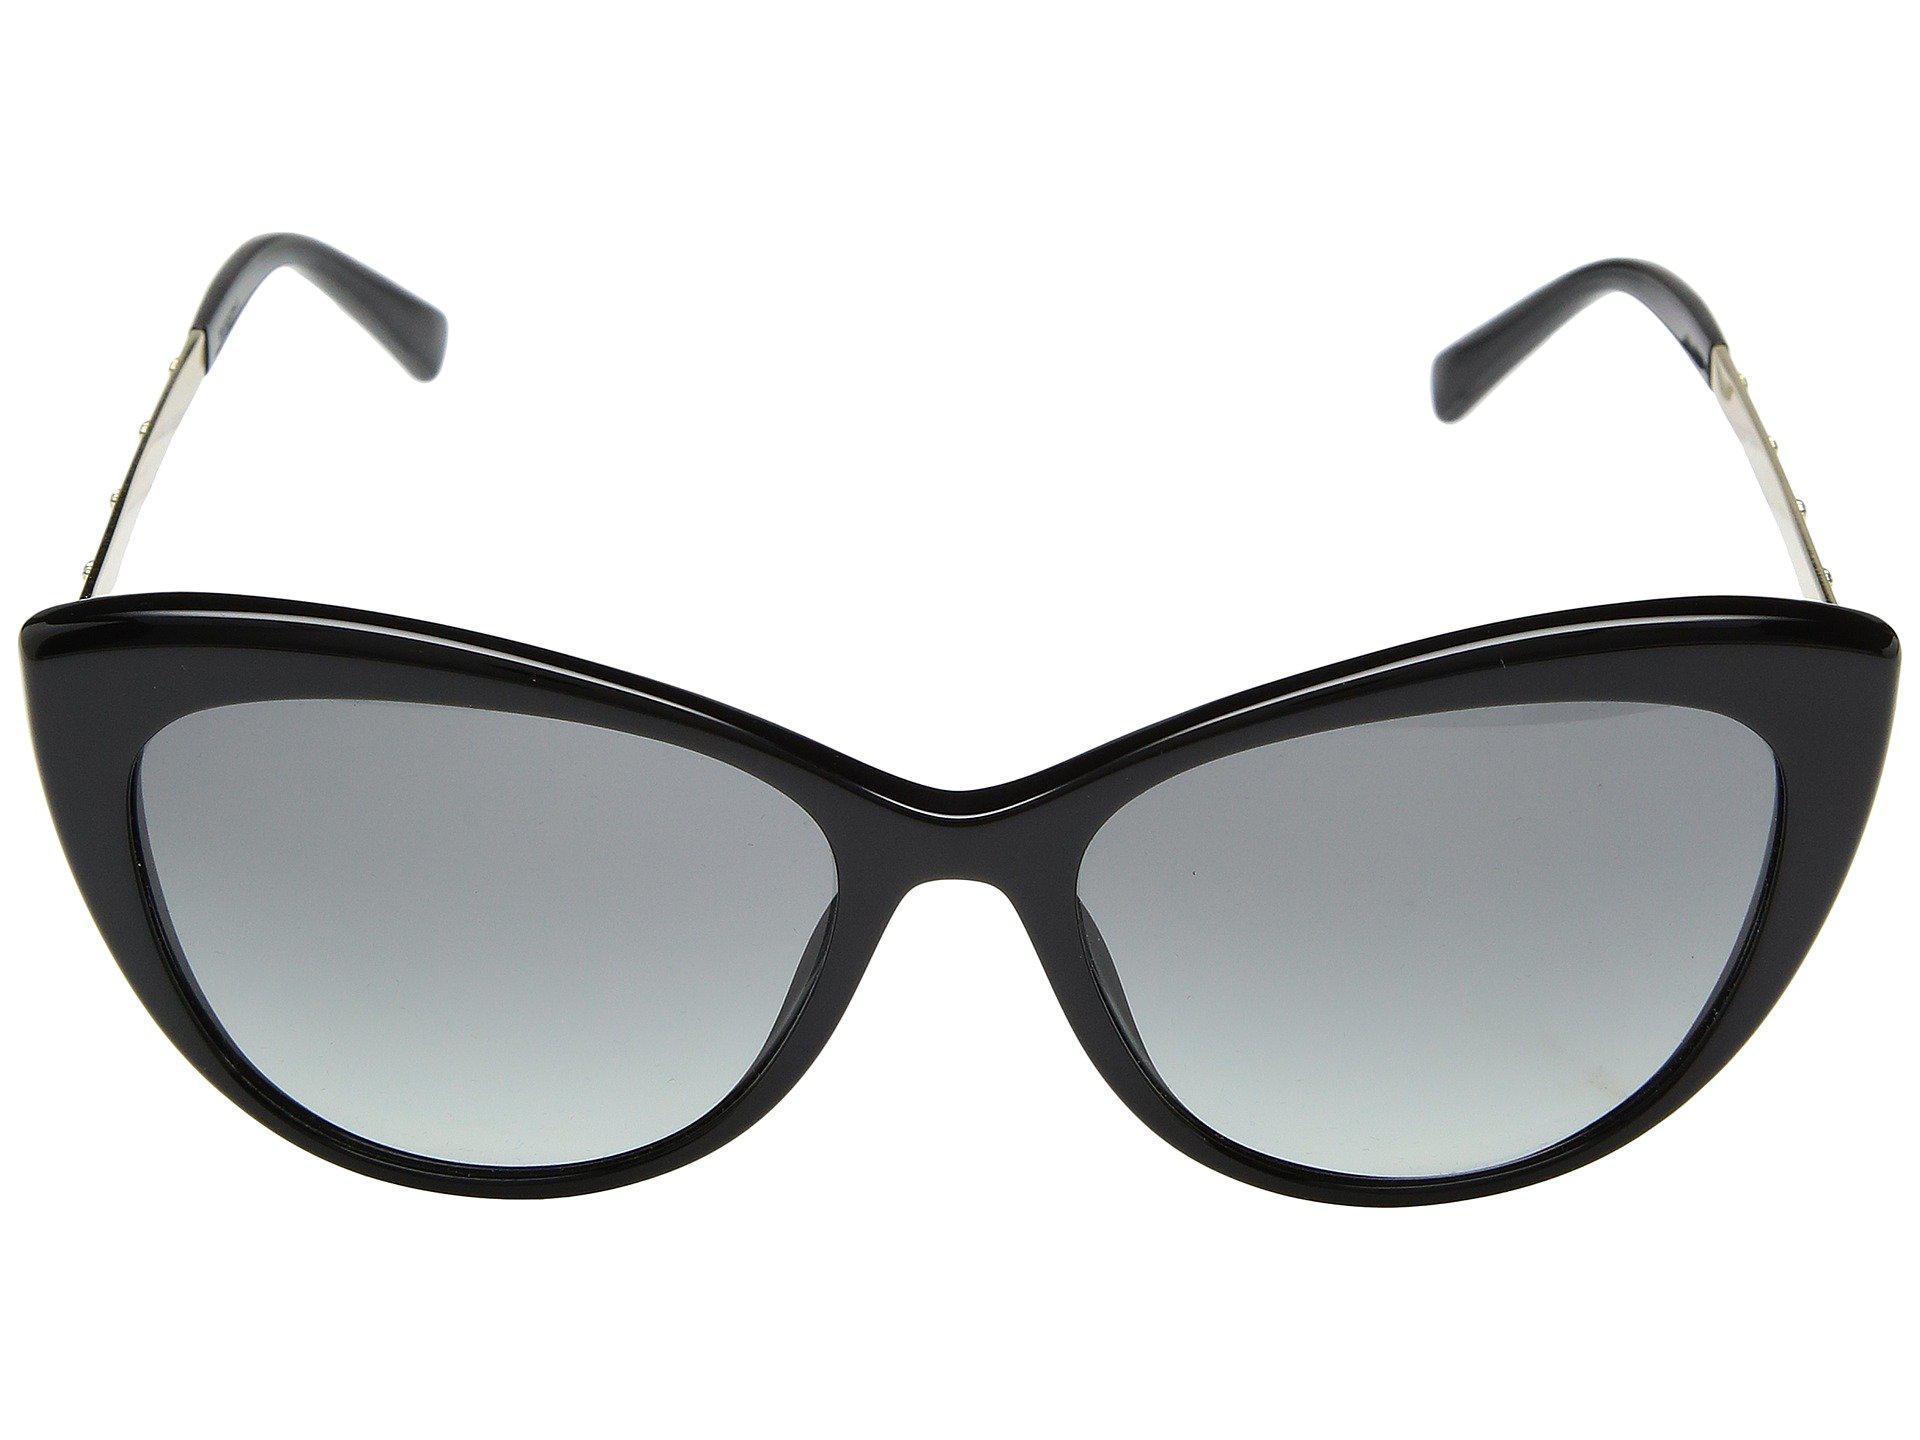 d6d336737f6 Lyst - Versace Ve4348 (black grey Gradient) Fashion Sunglasses in Black